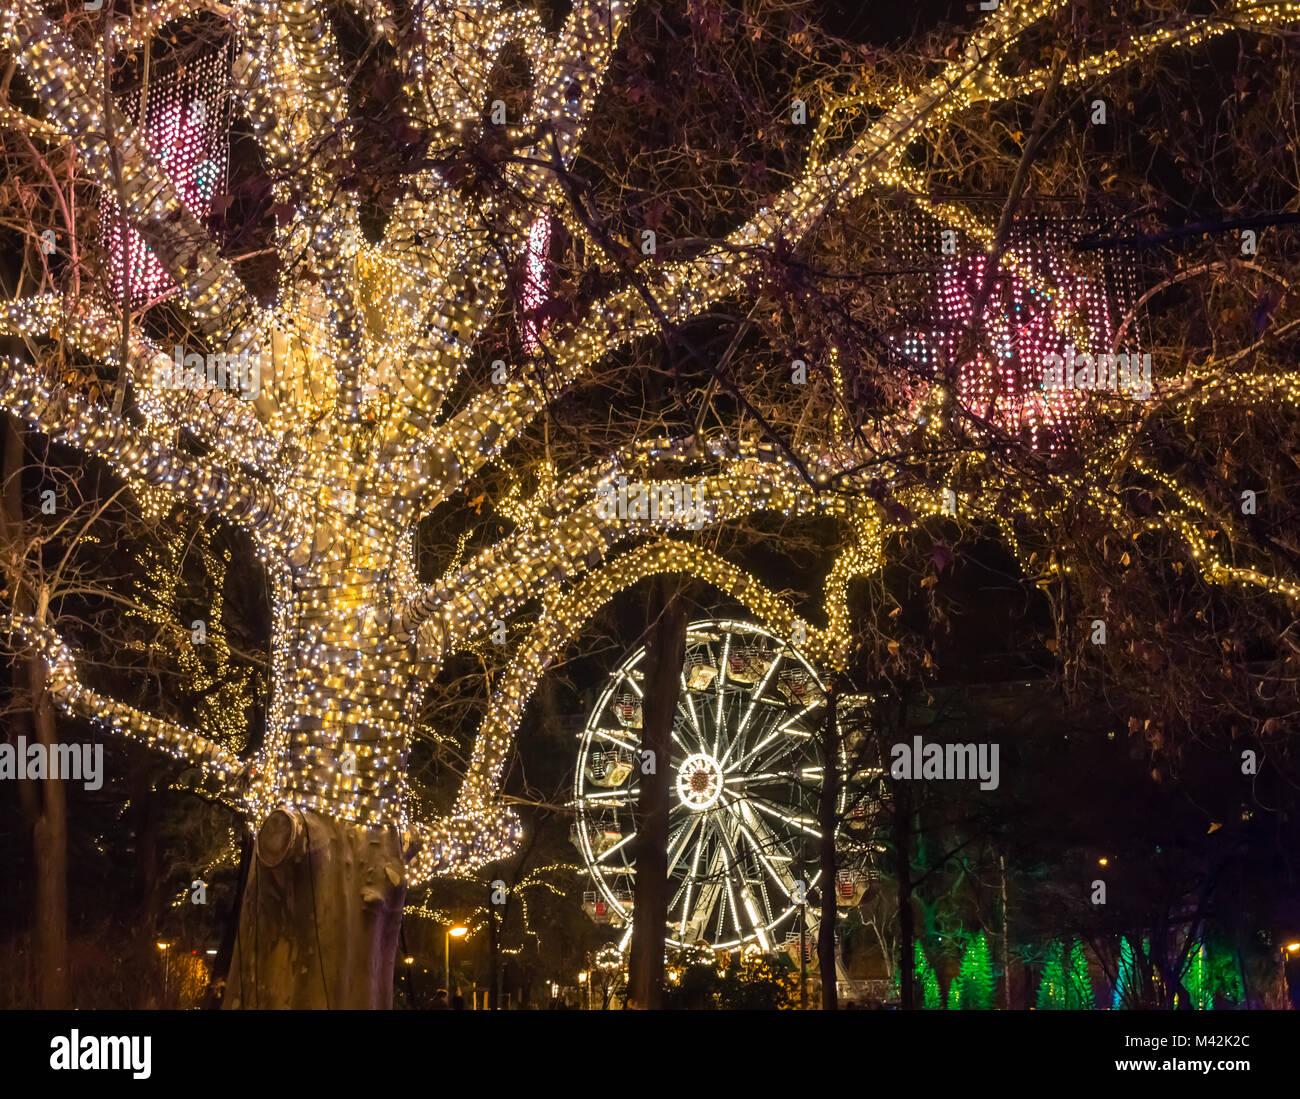 Christmas Room Stock Vector Image Of Illuminated: Austria Christmas Decorations Stock Photos & Austria